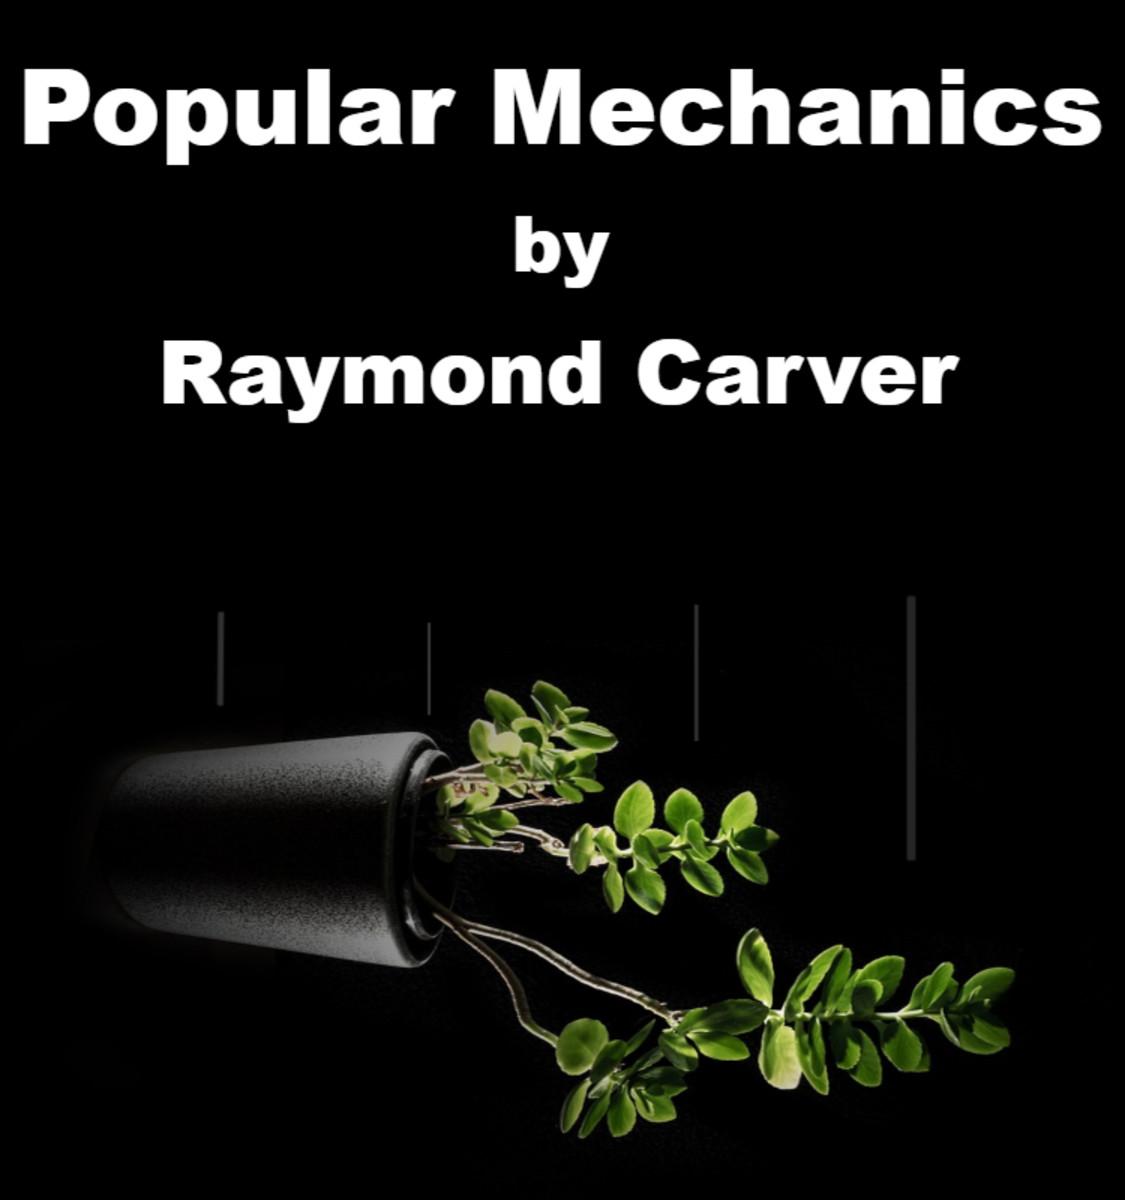 little-things-mine-popular-mechanics-themes-summary